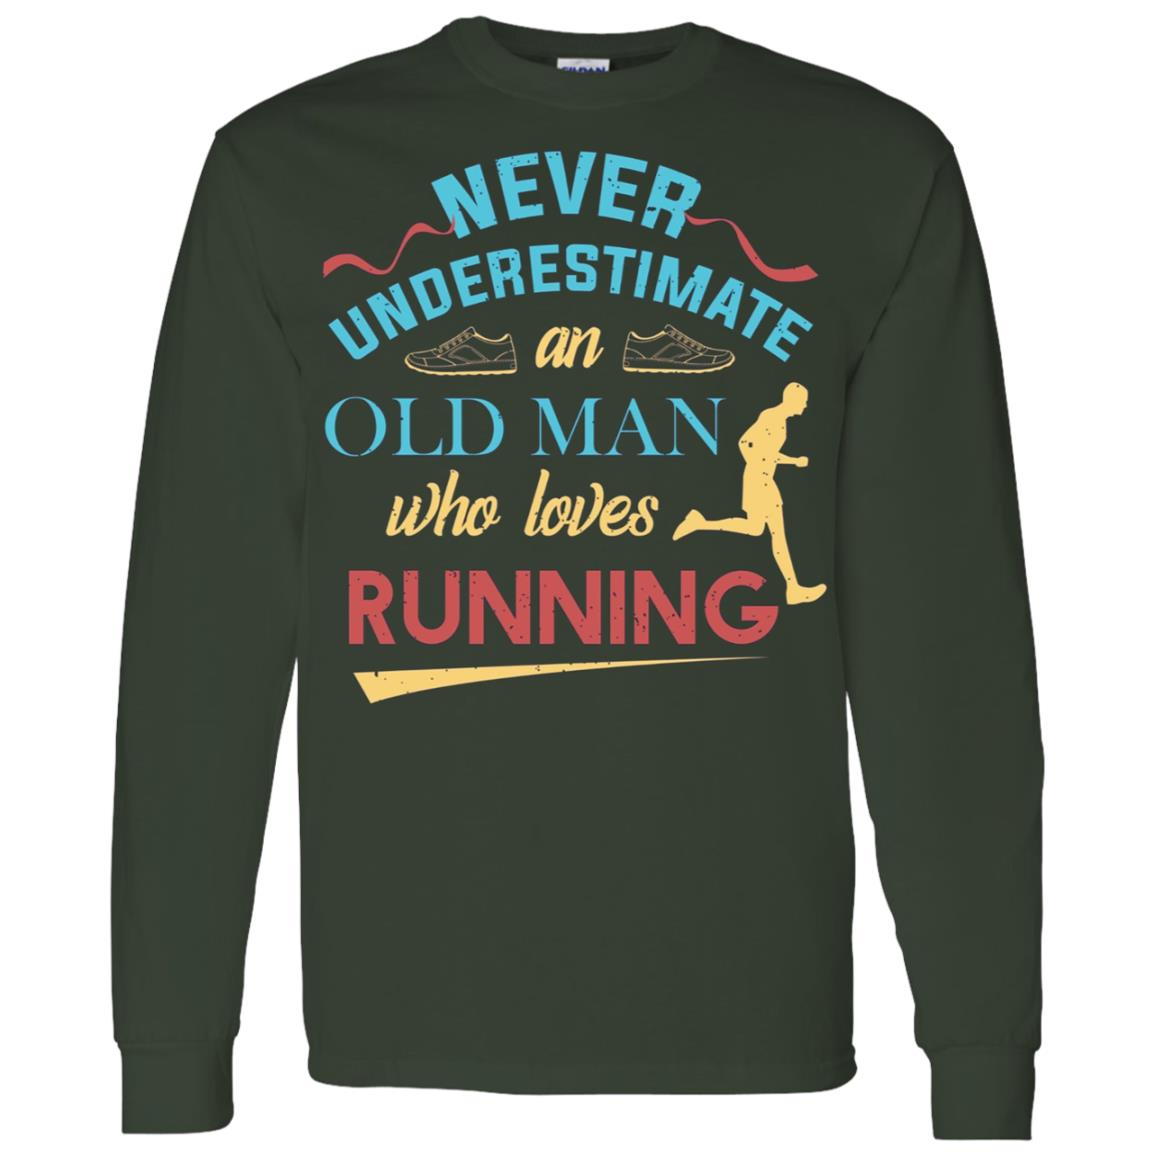 Funny Runner Gifts Old Man Loves To Run Dad Grandpa Men Long Sleeve T-Shirt